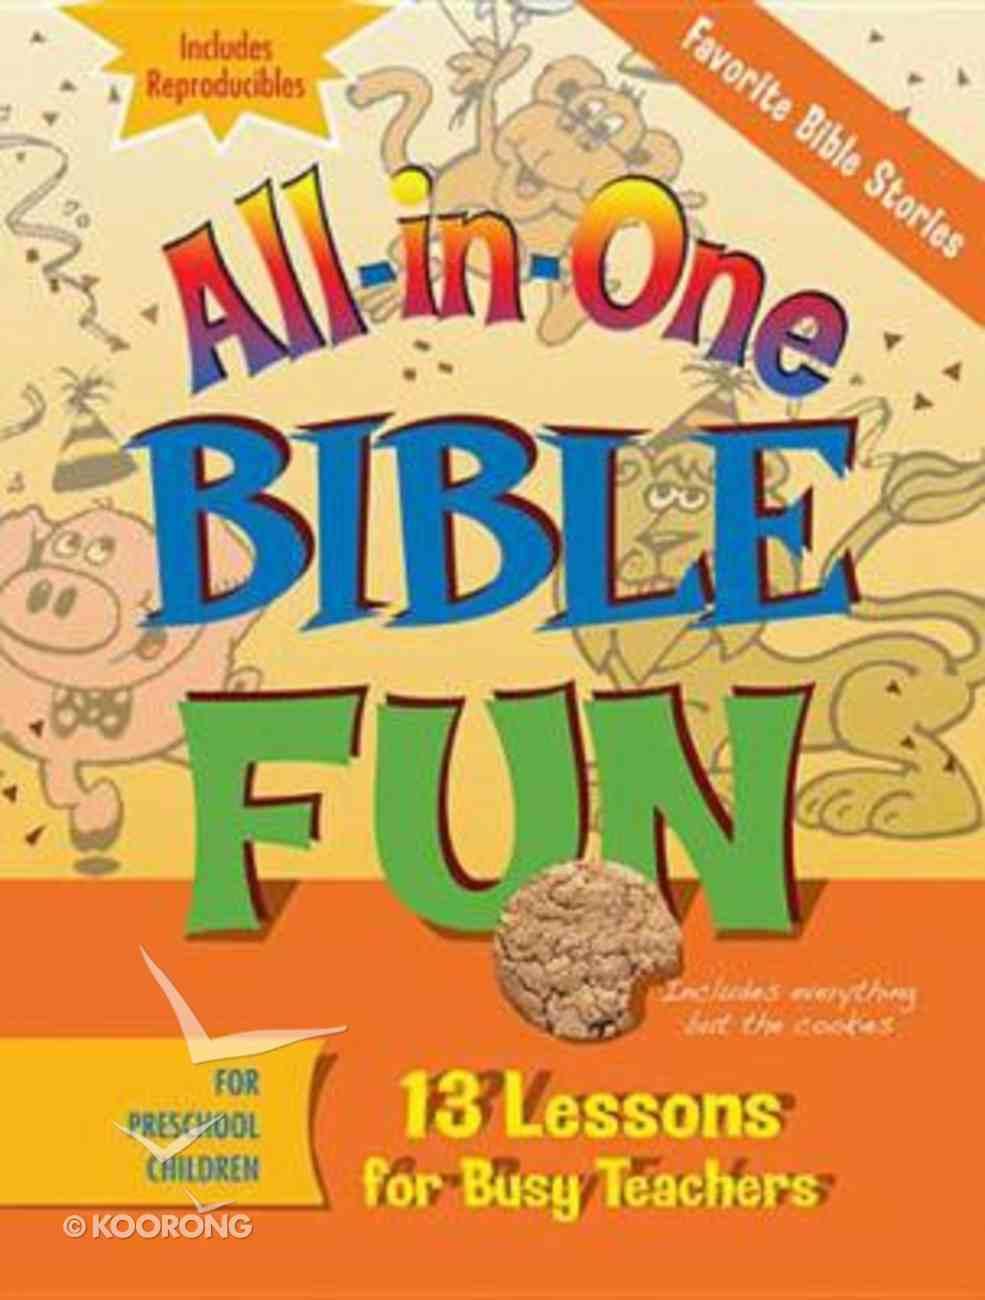 Favourite Stories of the Bible - Preschool (Bible Fun) (All In One Bible Fun Series) Paperback